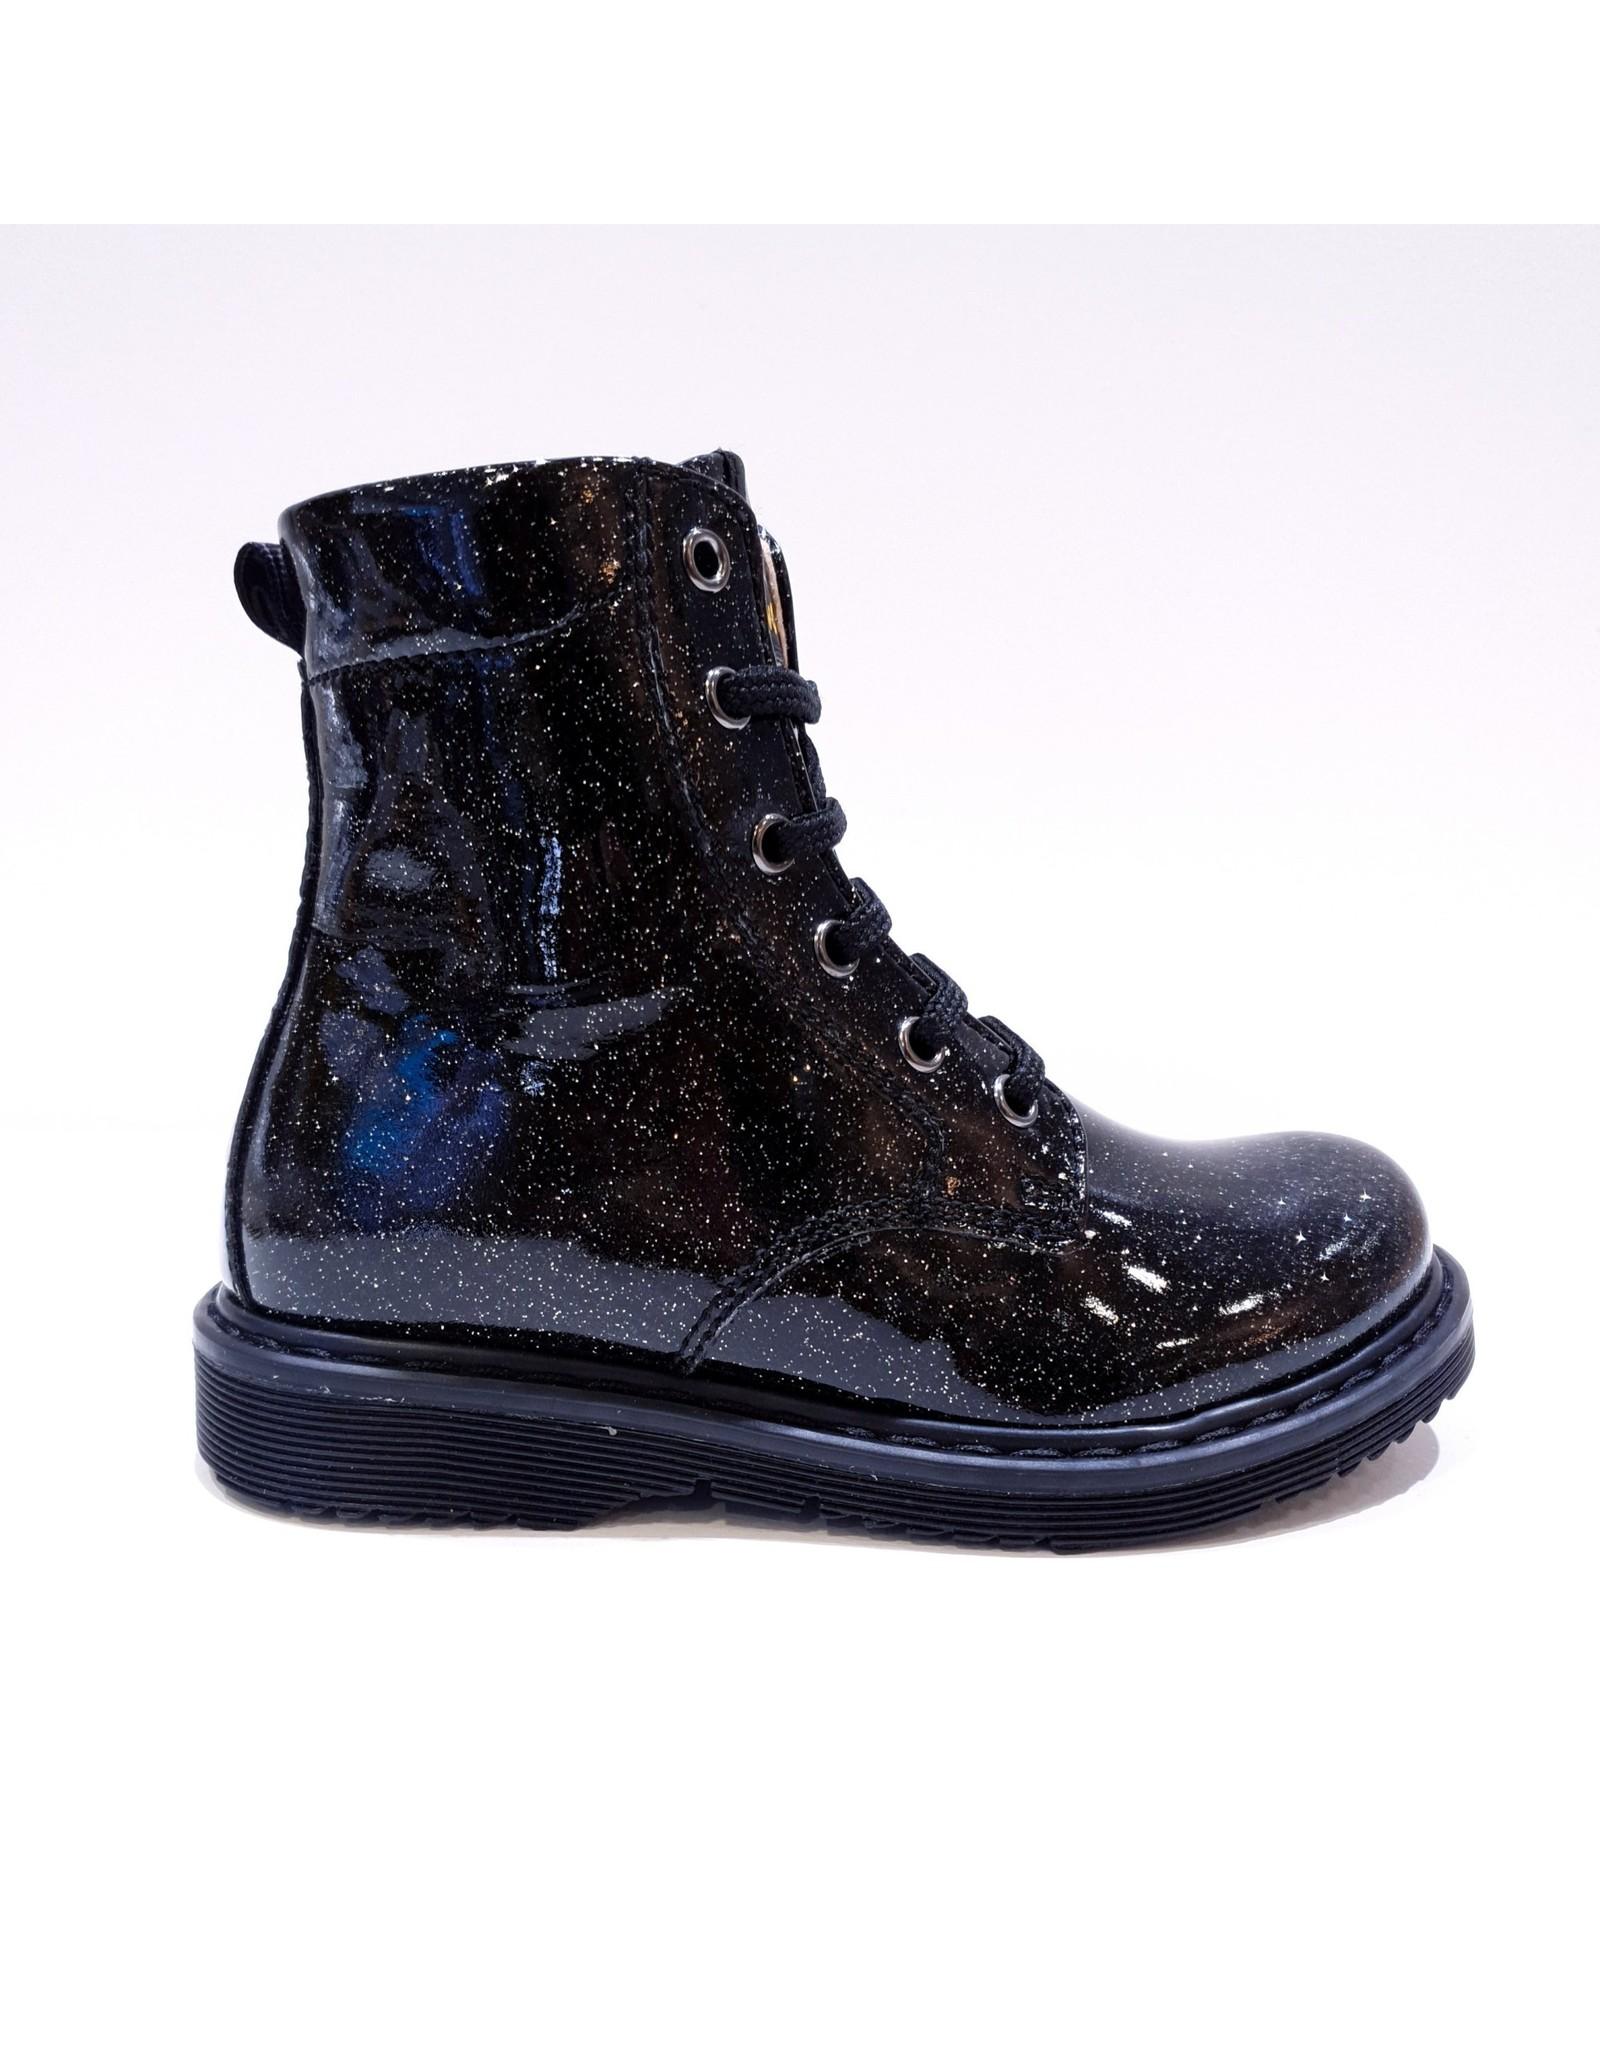 Walkey veterlaars grey glitter